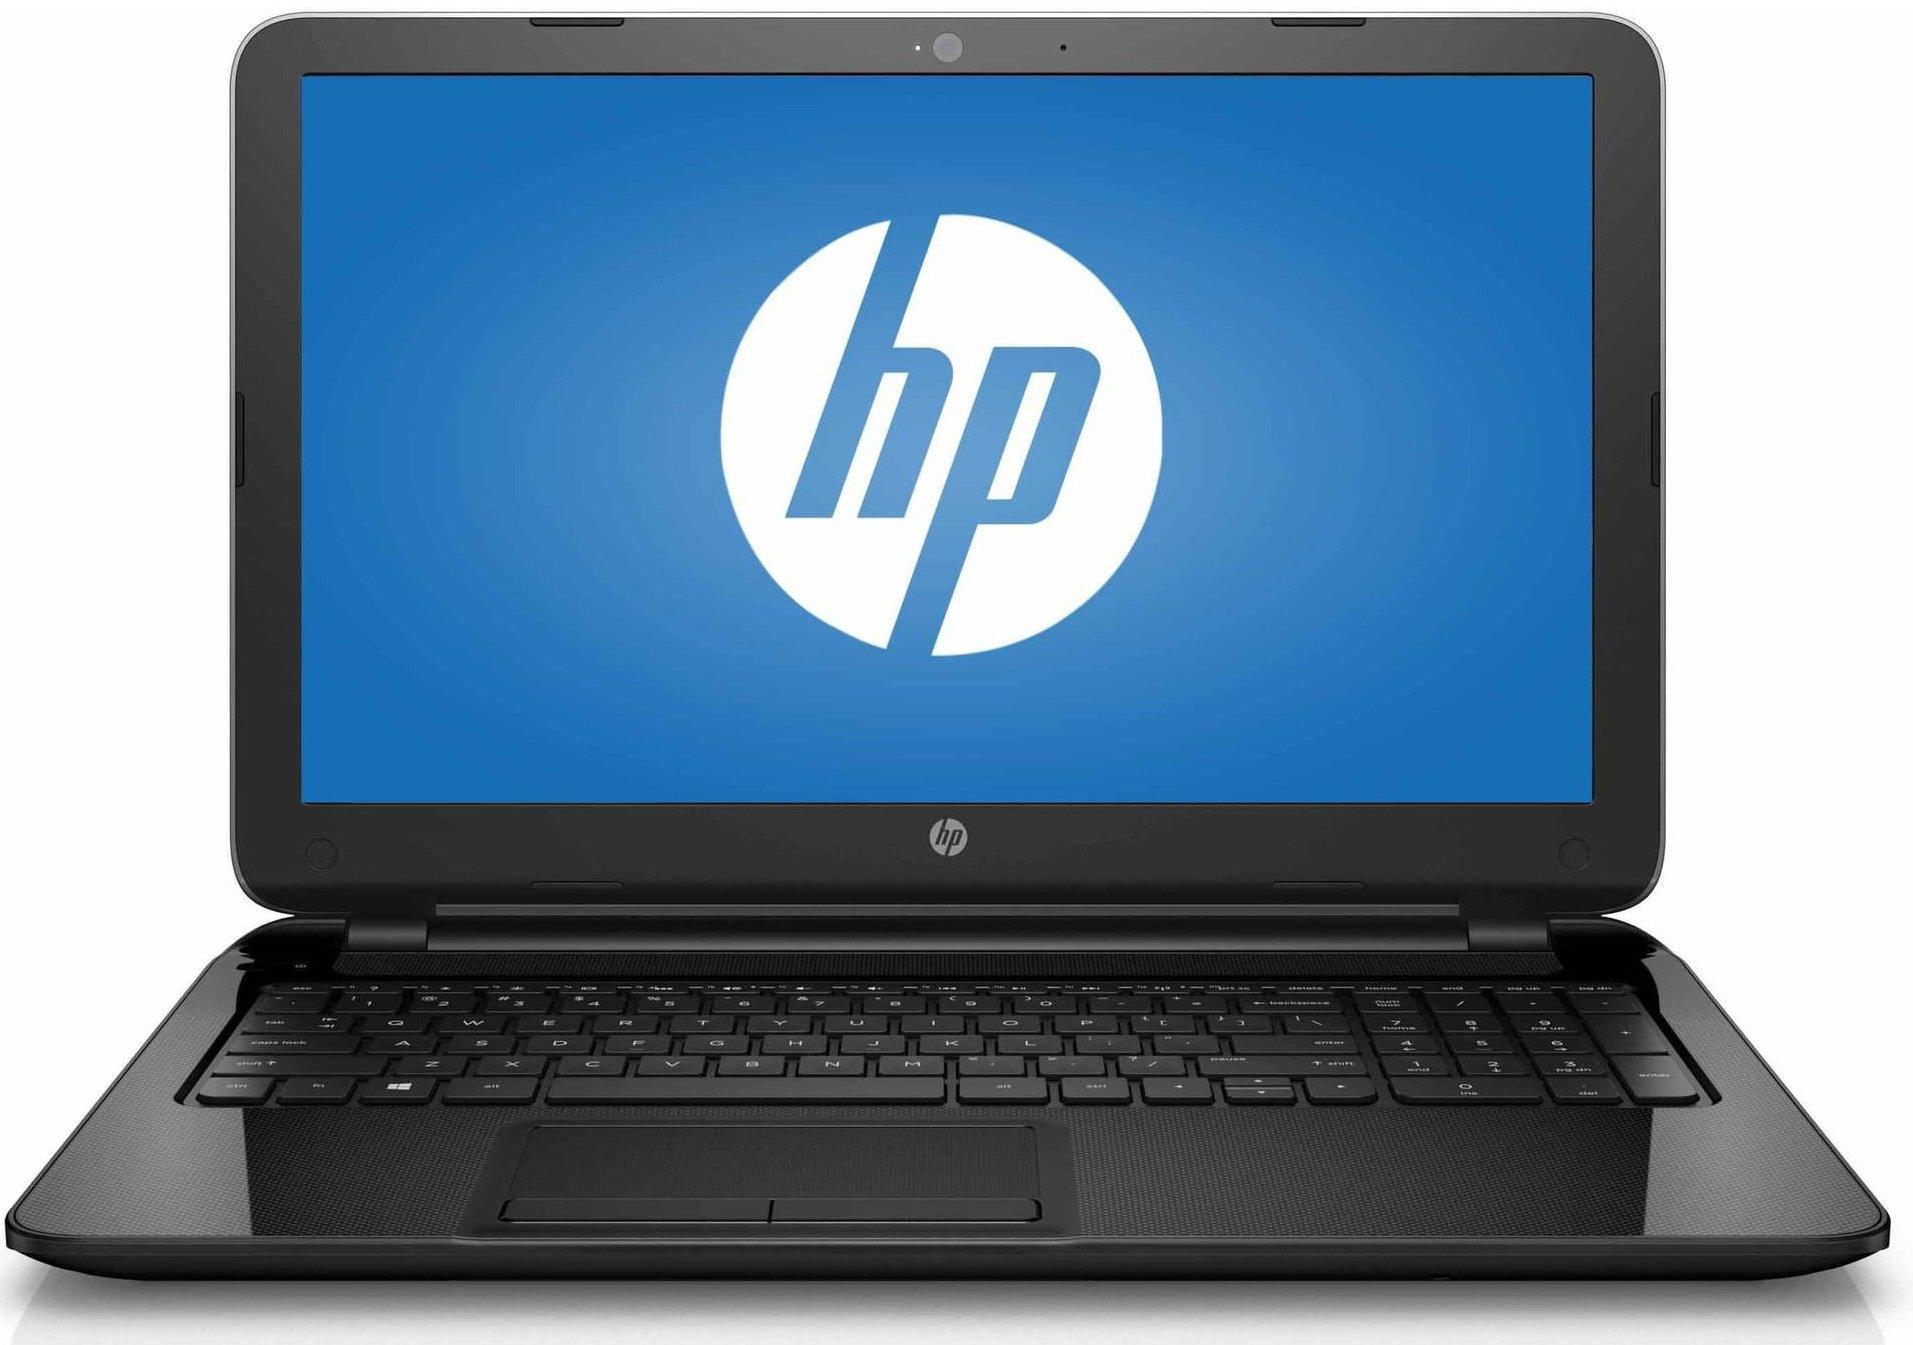 HP 15.6'' HD Laptop Computer (Intel Dual Core Celeron N3050 up to 2.16 GHz Processor, 4GB RAM, 500GB HDD, USB 3.0, Webcam, HDMI, DVDRW, Wifi, Windows 10) (Certified Refurbished)